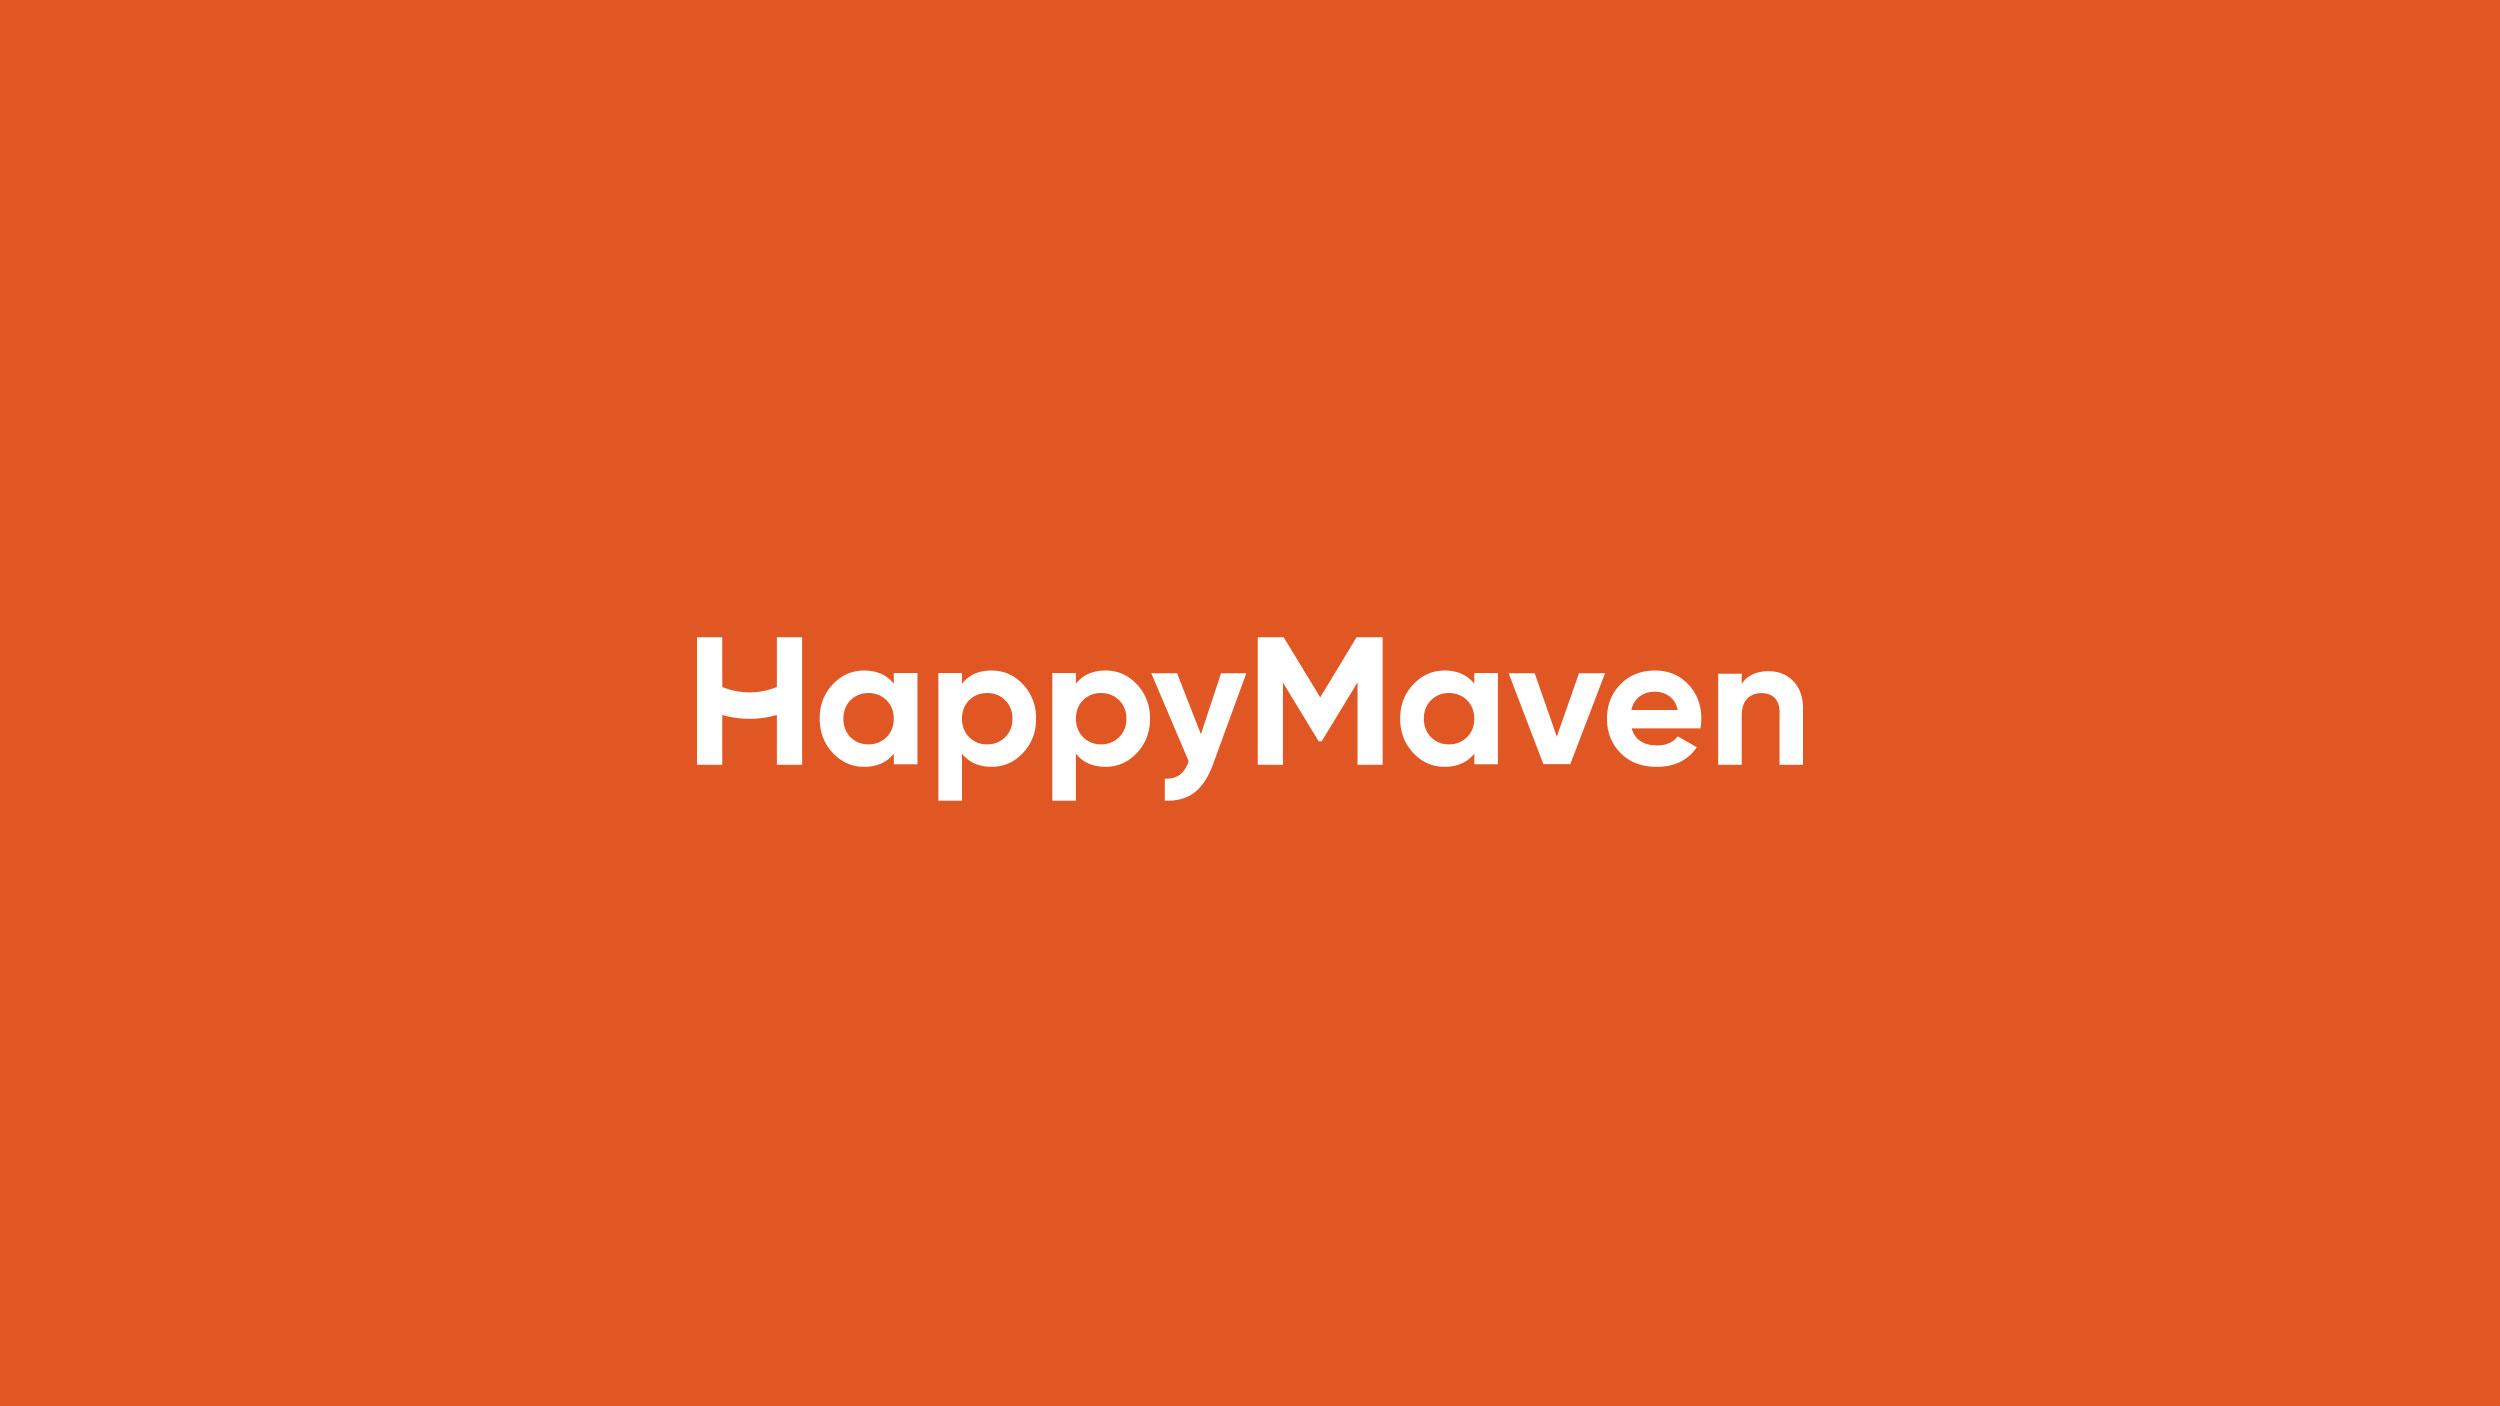 HappyMaven logo design